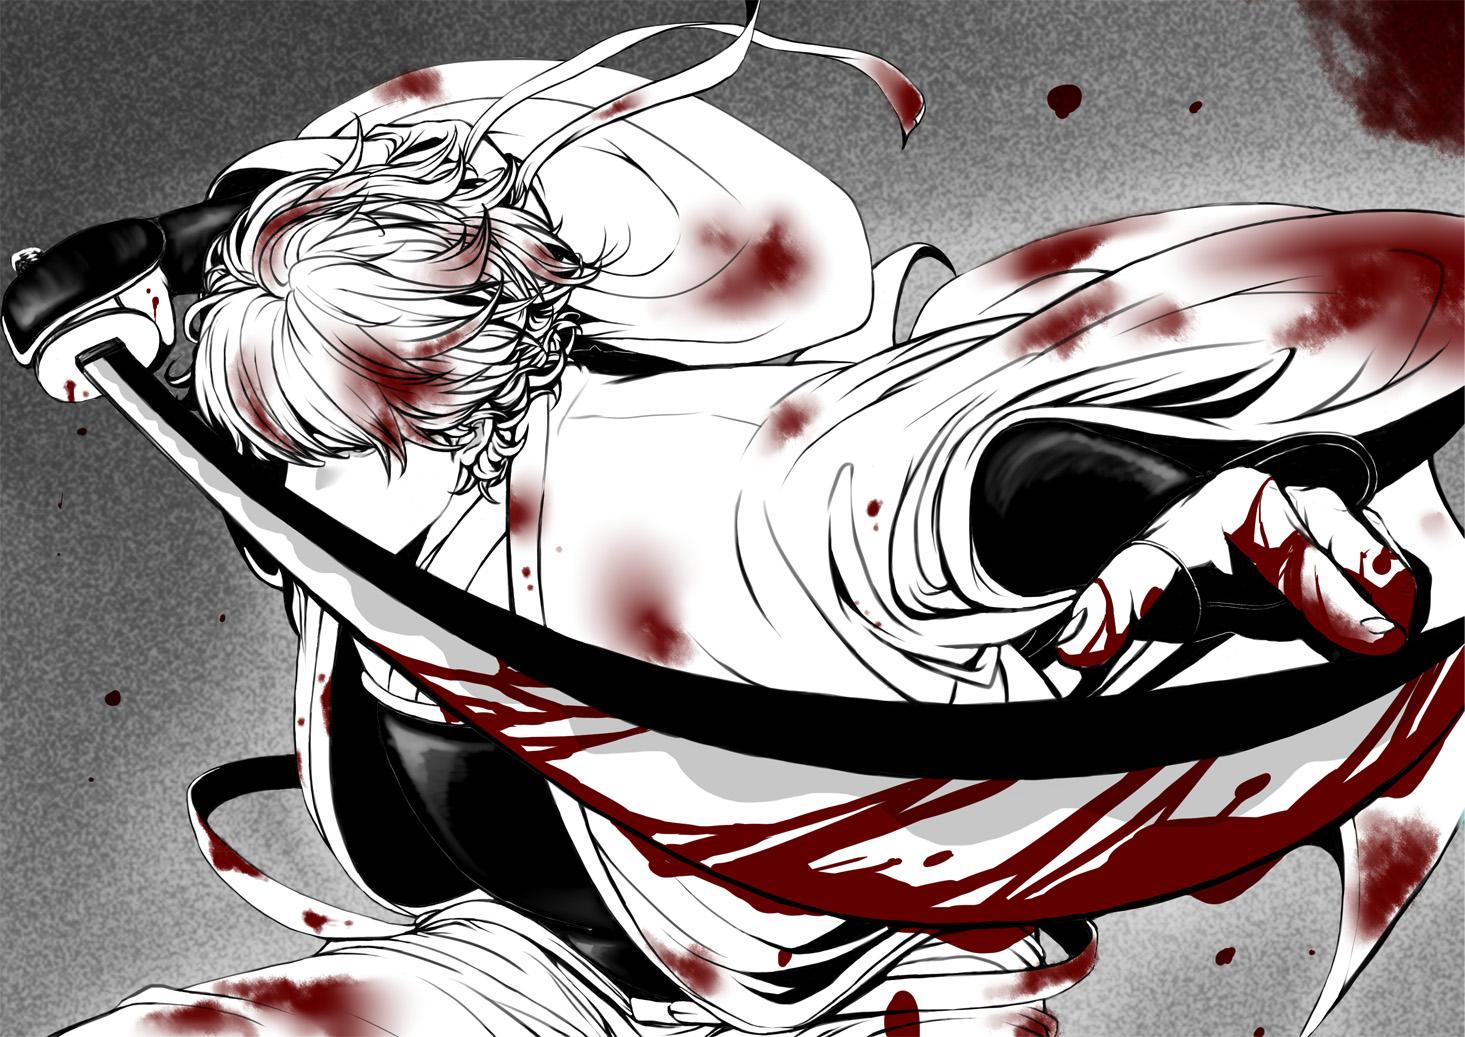 Shiroyasha(beyaz şeytan)